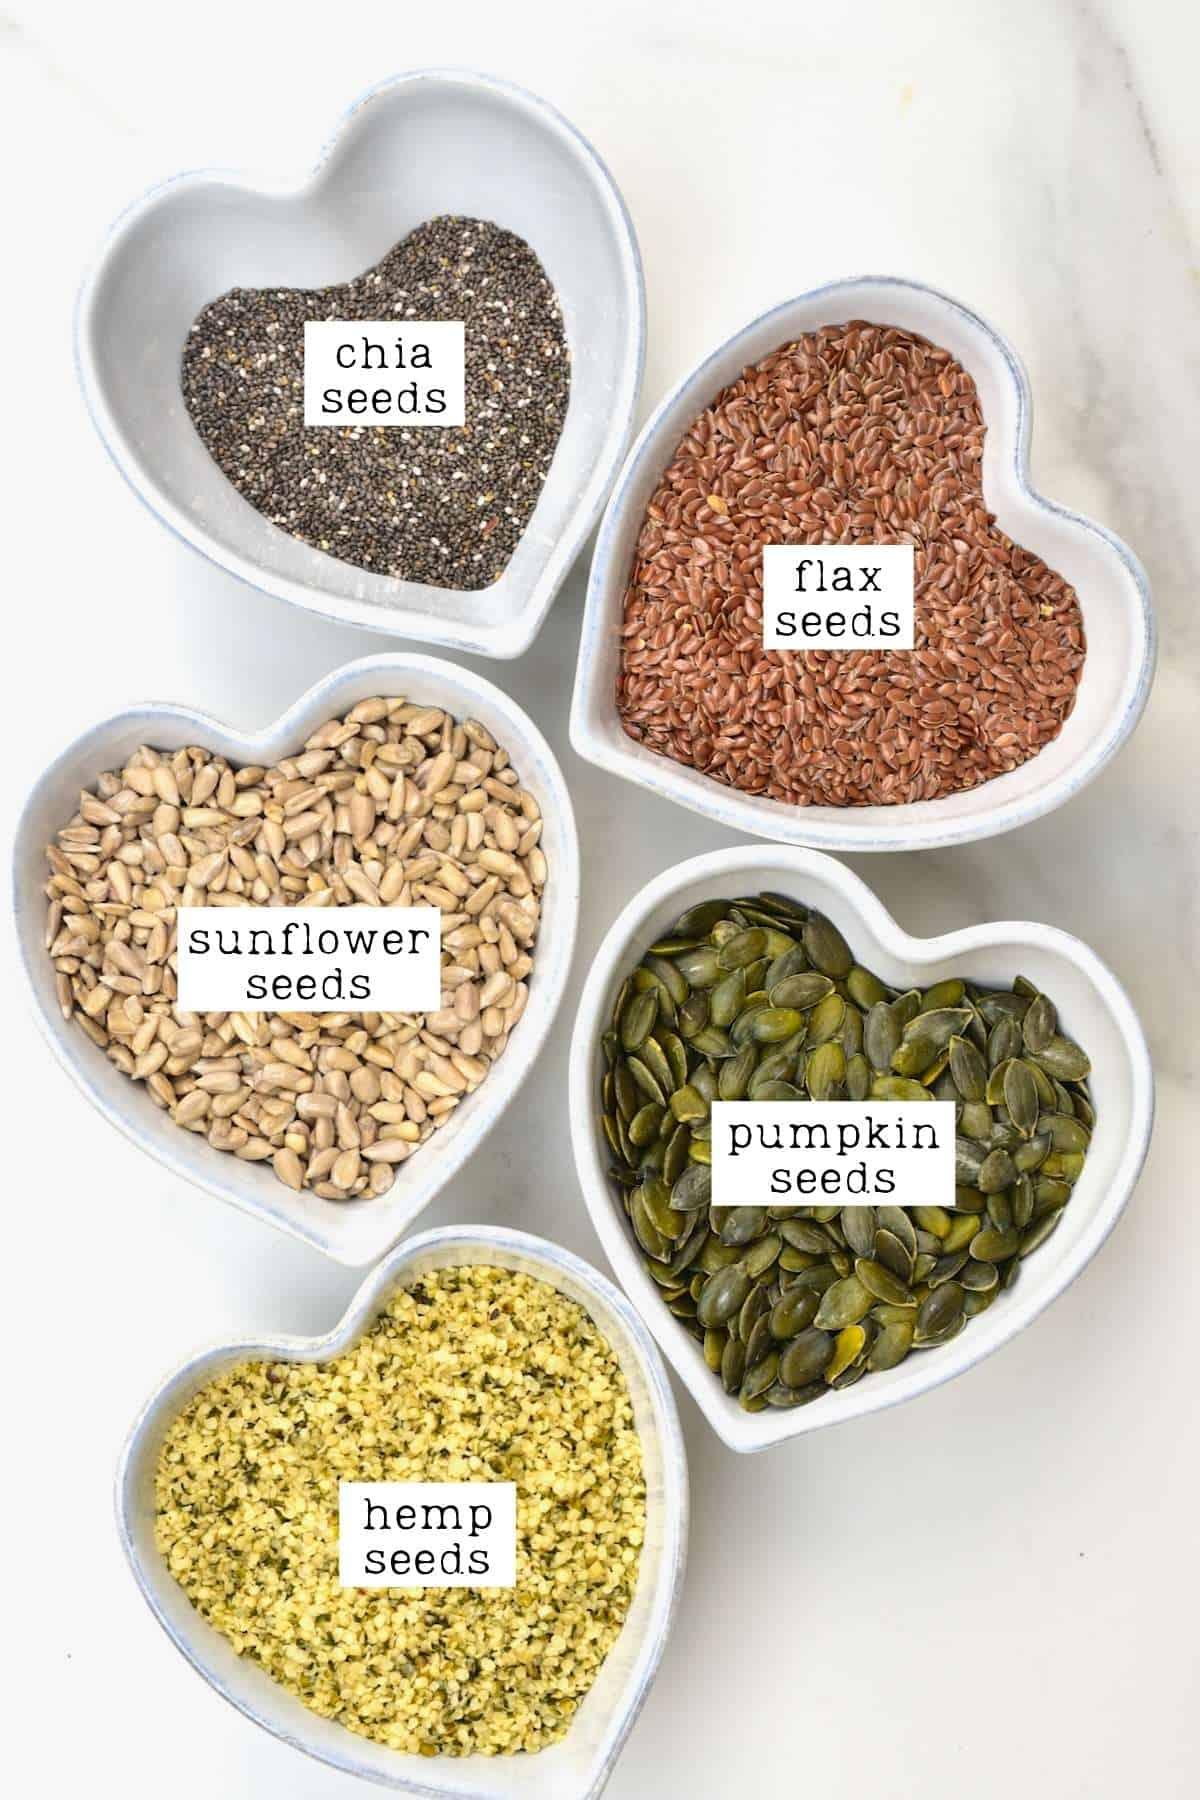 Ingredients for omega butter